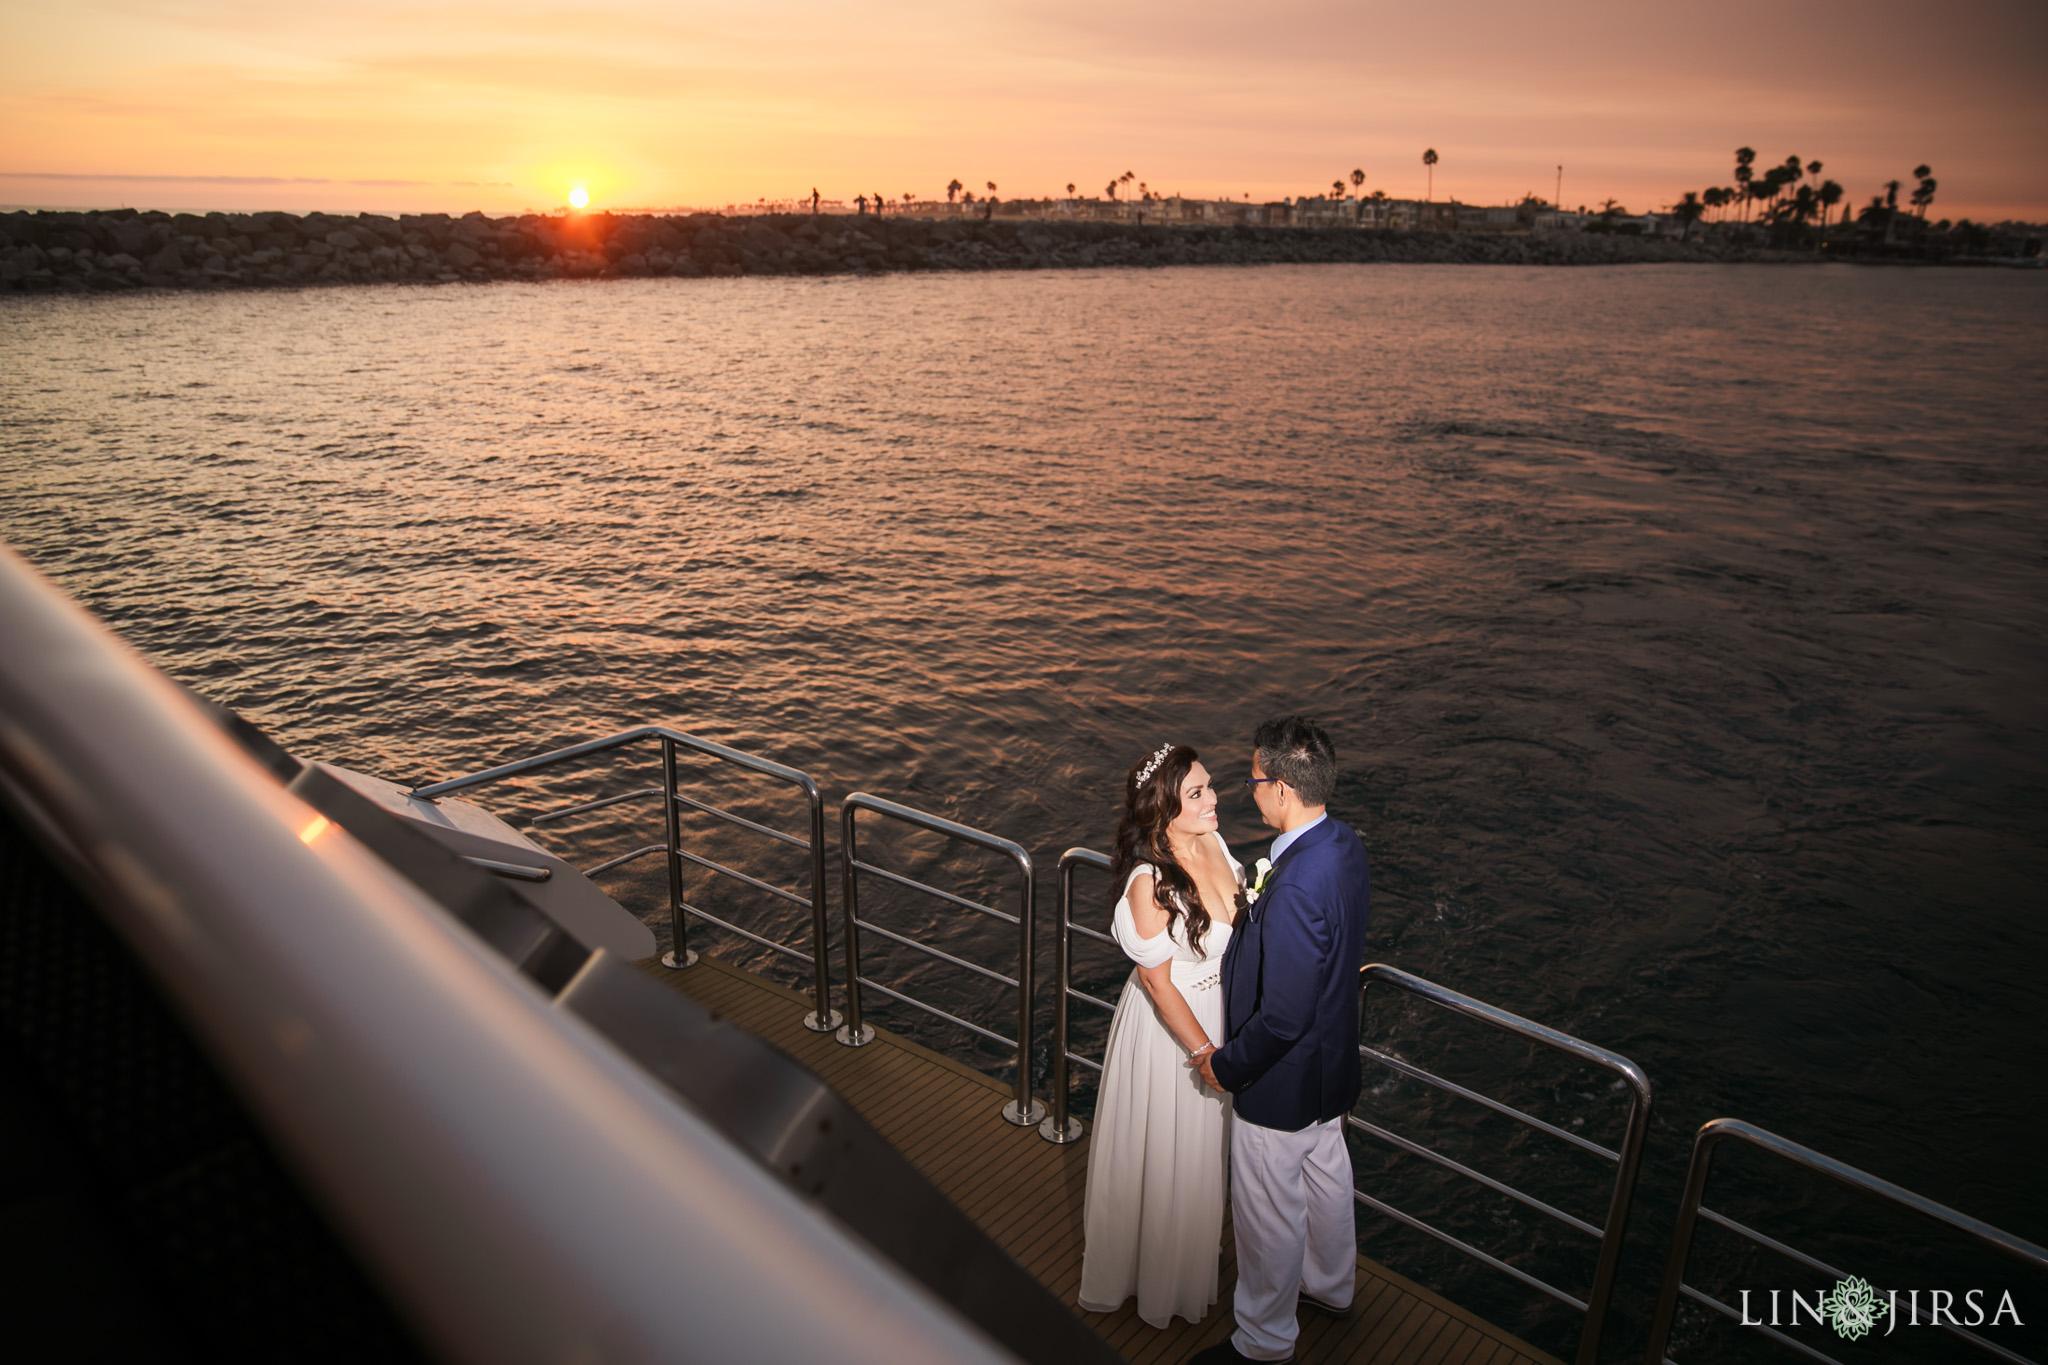 025 charter yachts newport beach wedding reception sunset photography